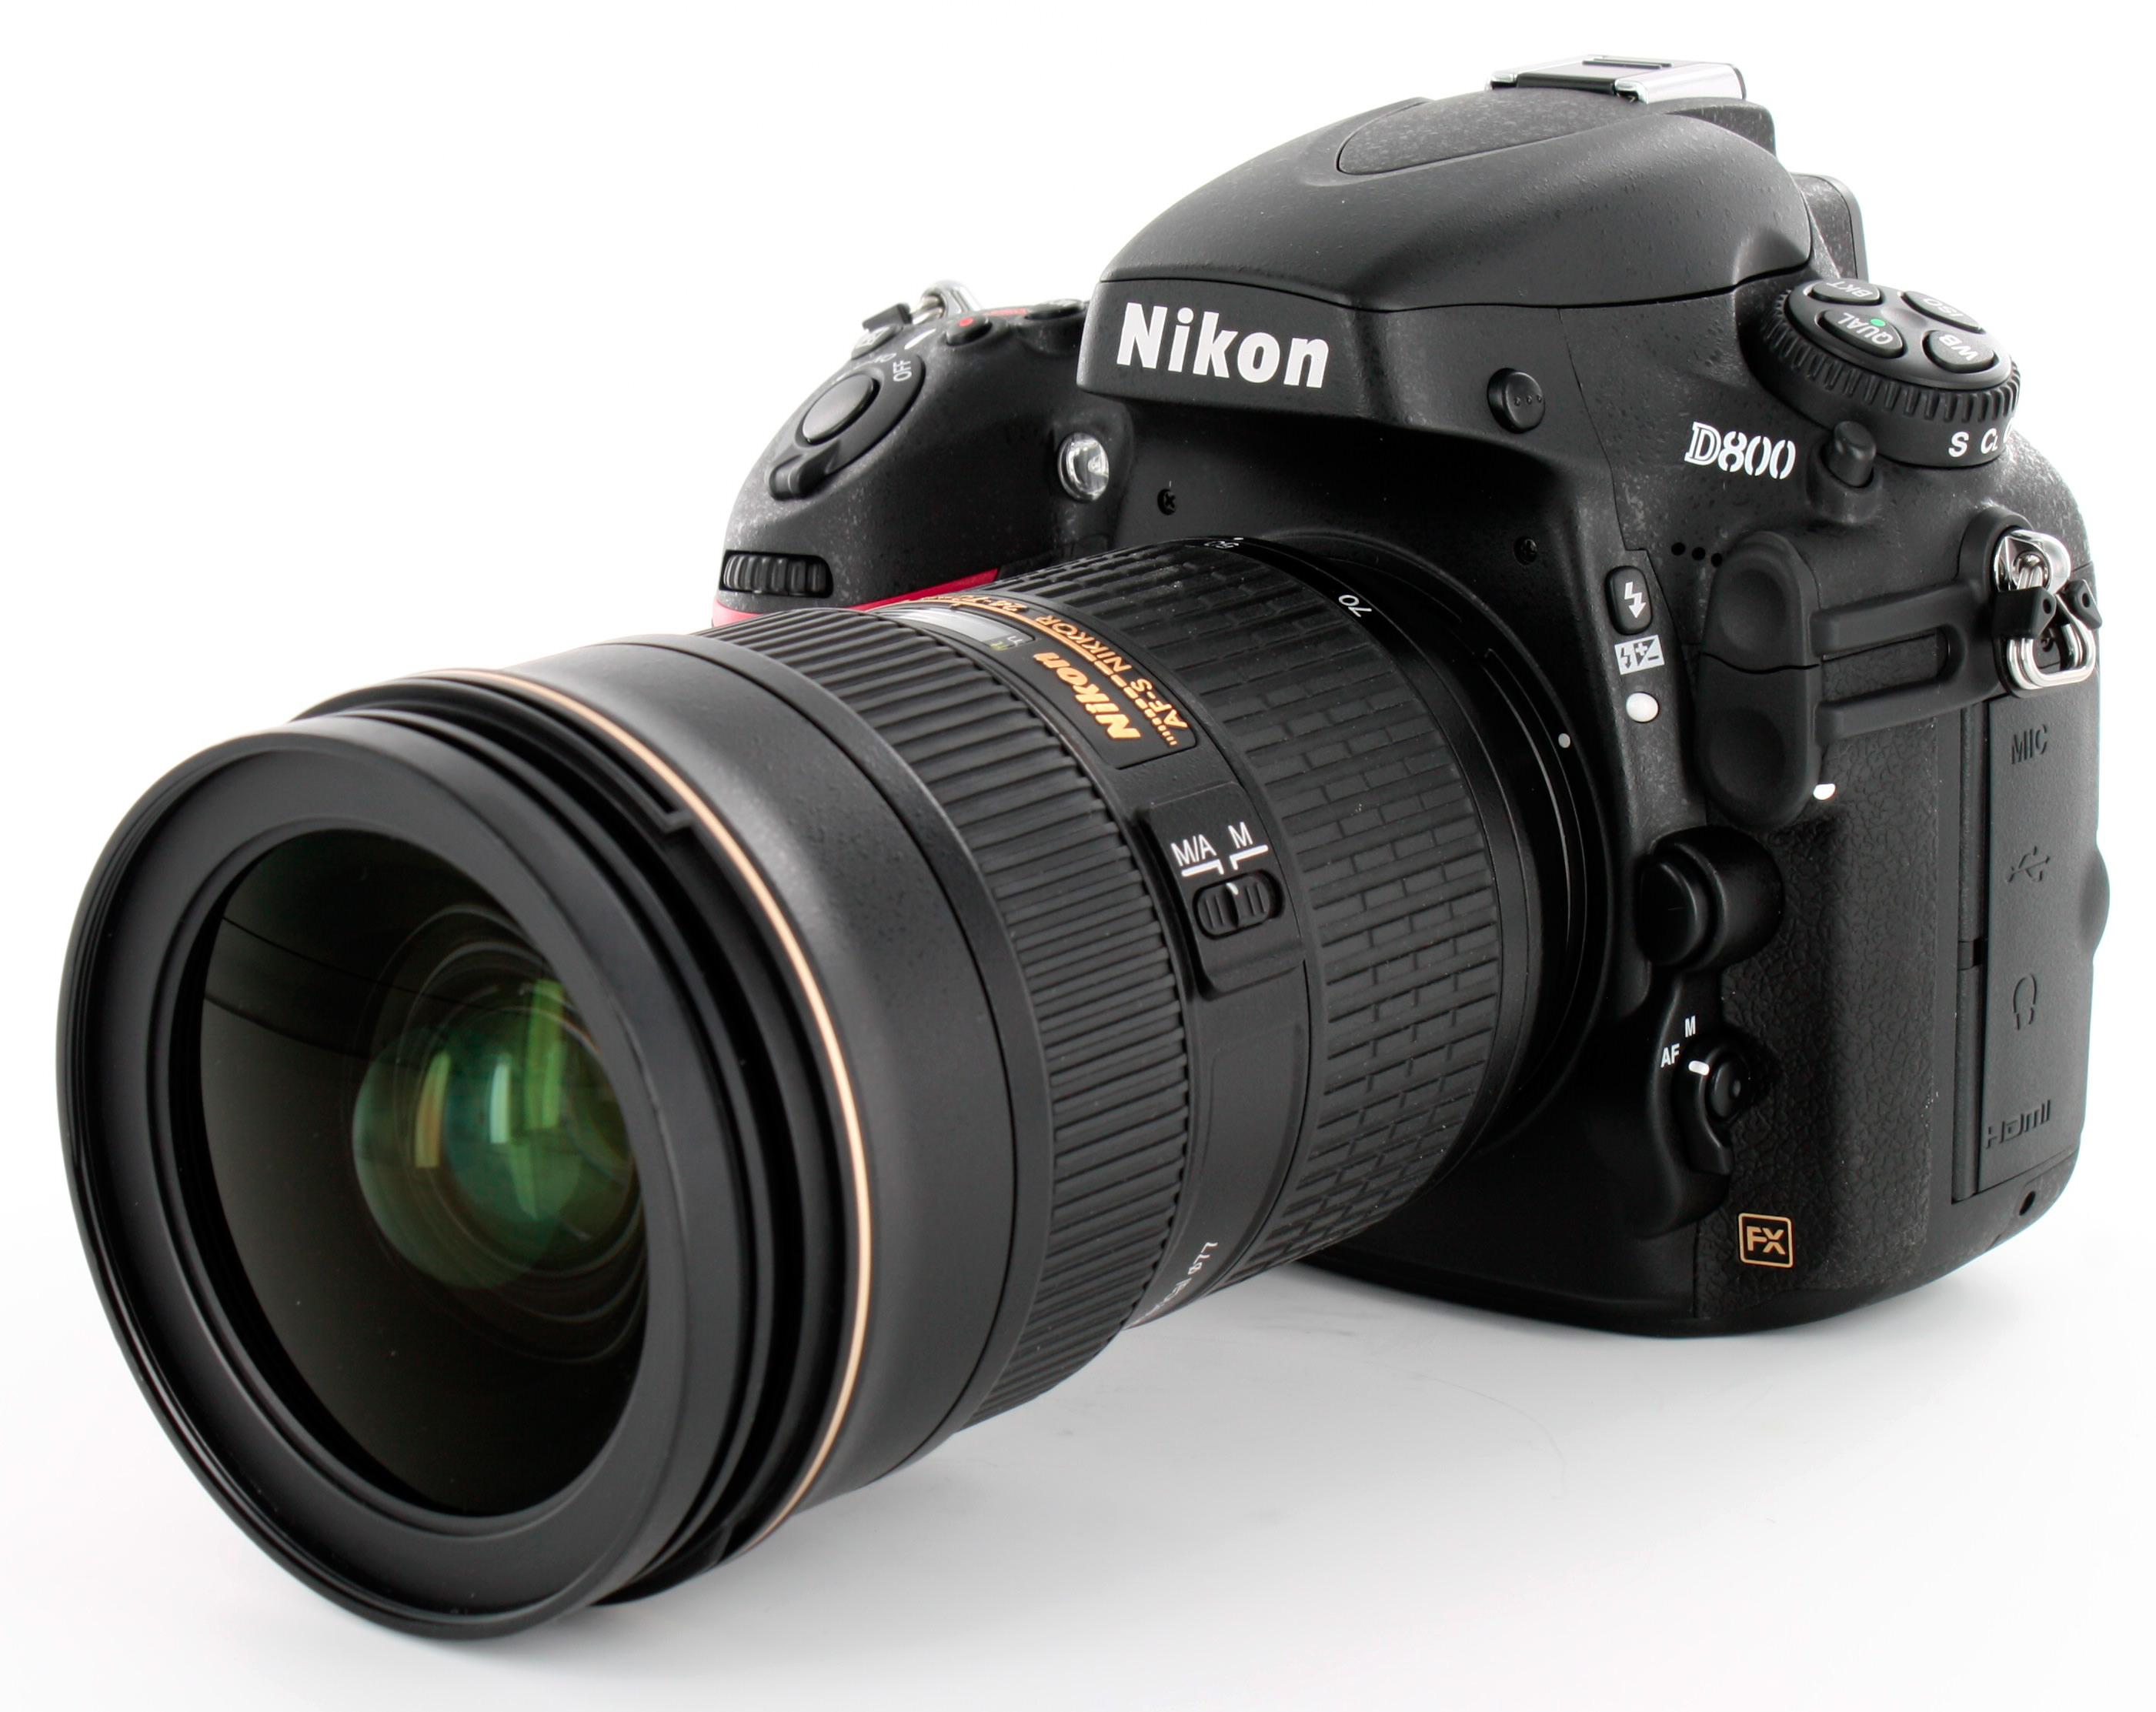 Camera Best Dslr Camera Canon Or Nikon ephotozine best cameras of the year awards 2012 pro full frame digital slr